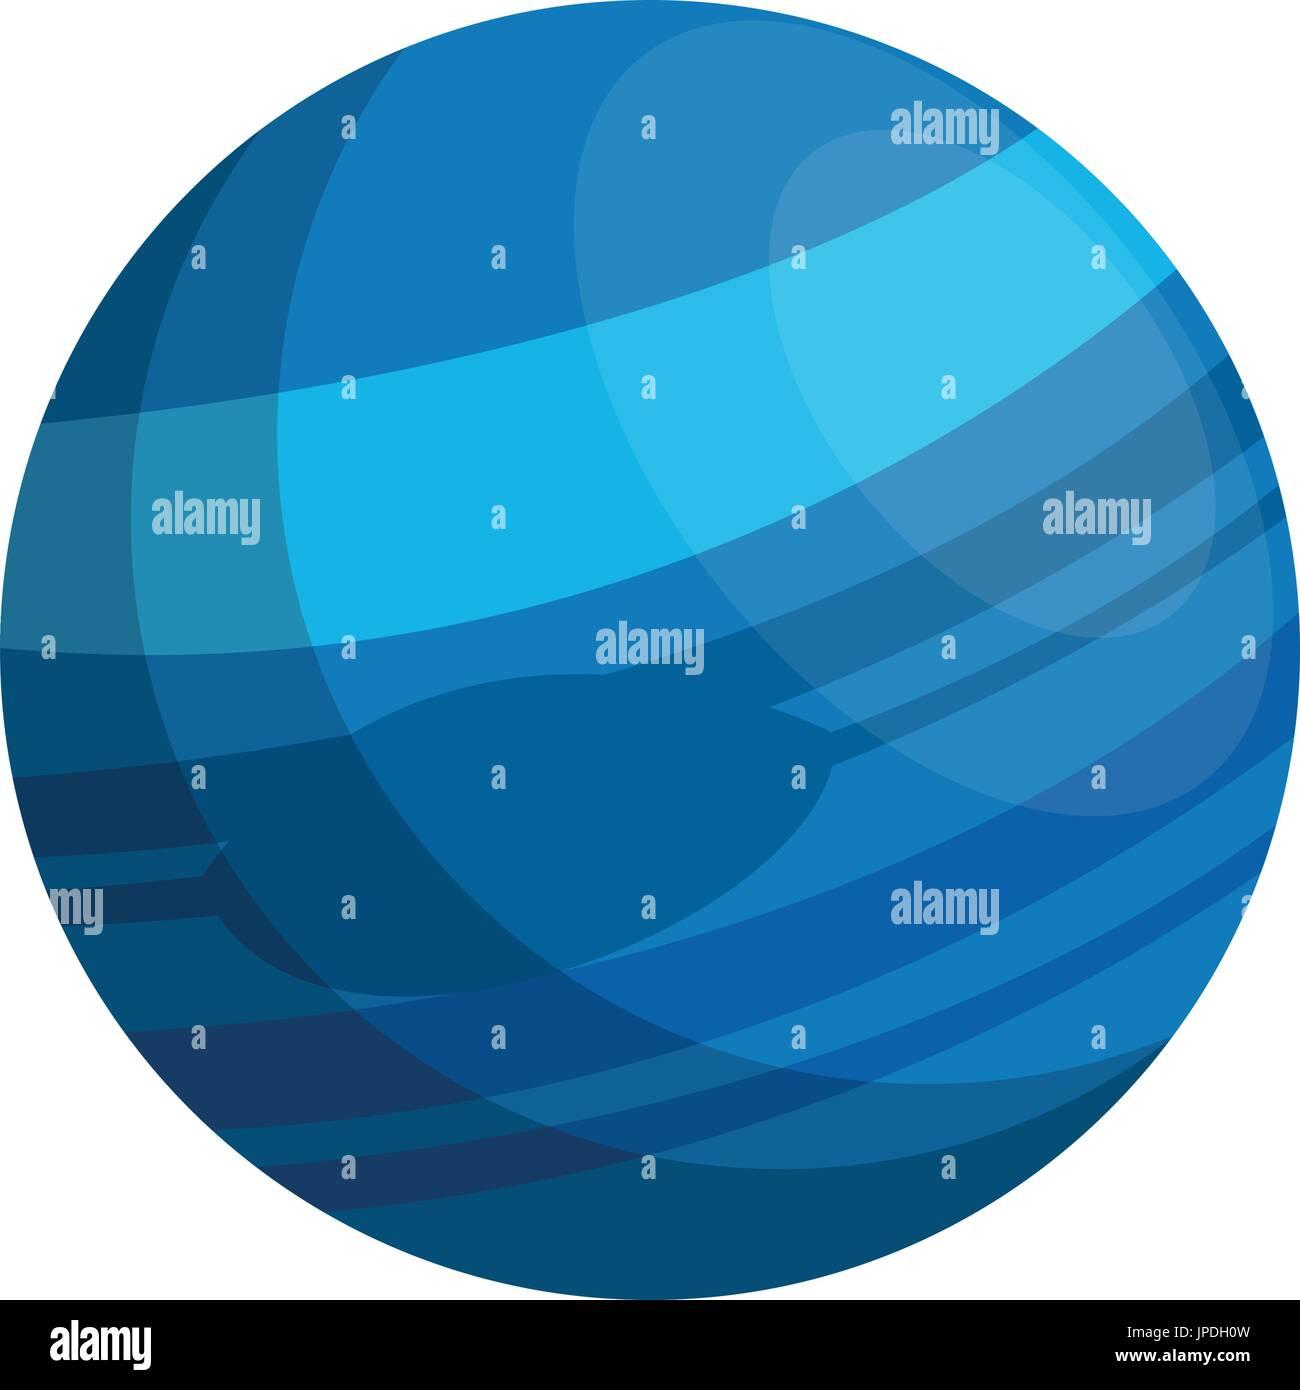 planet icon image  - Stock Vector